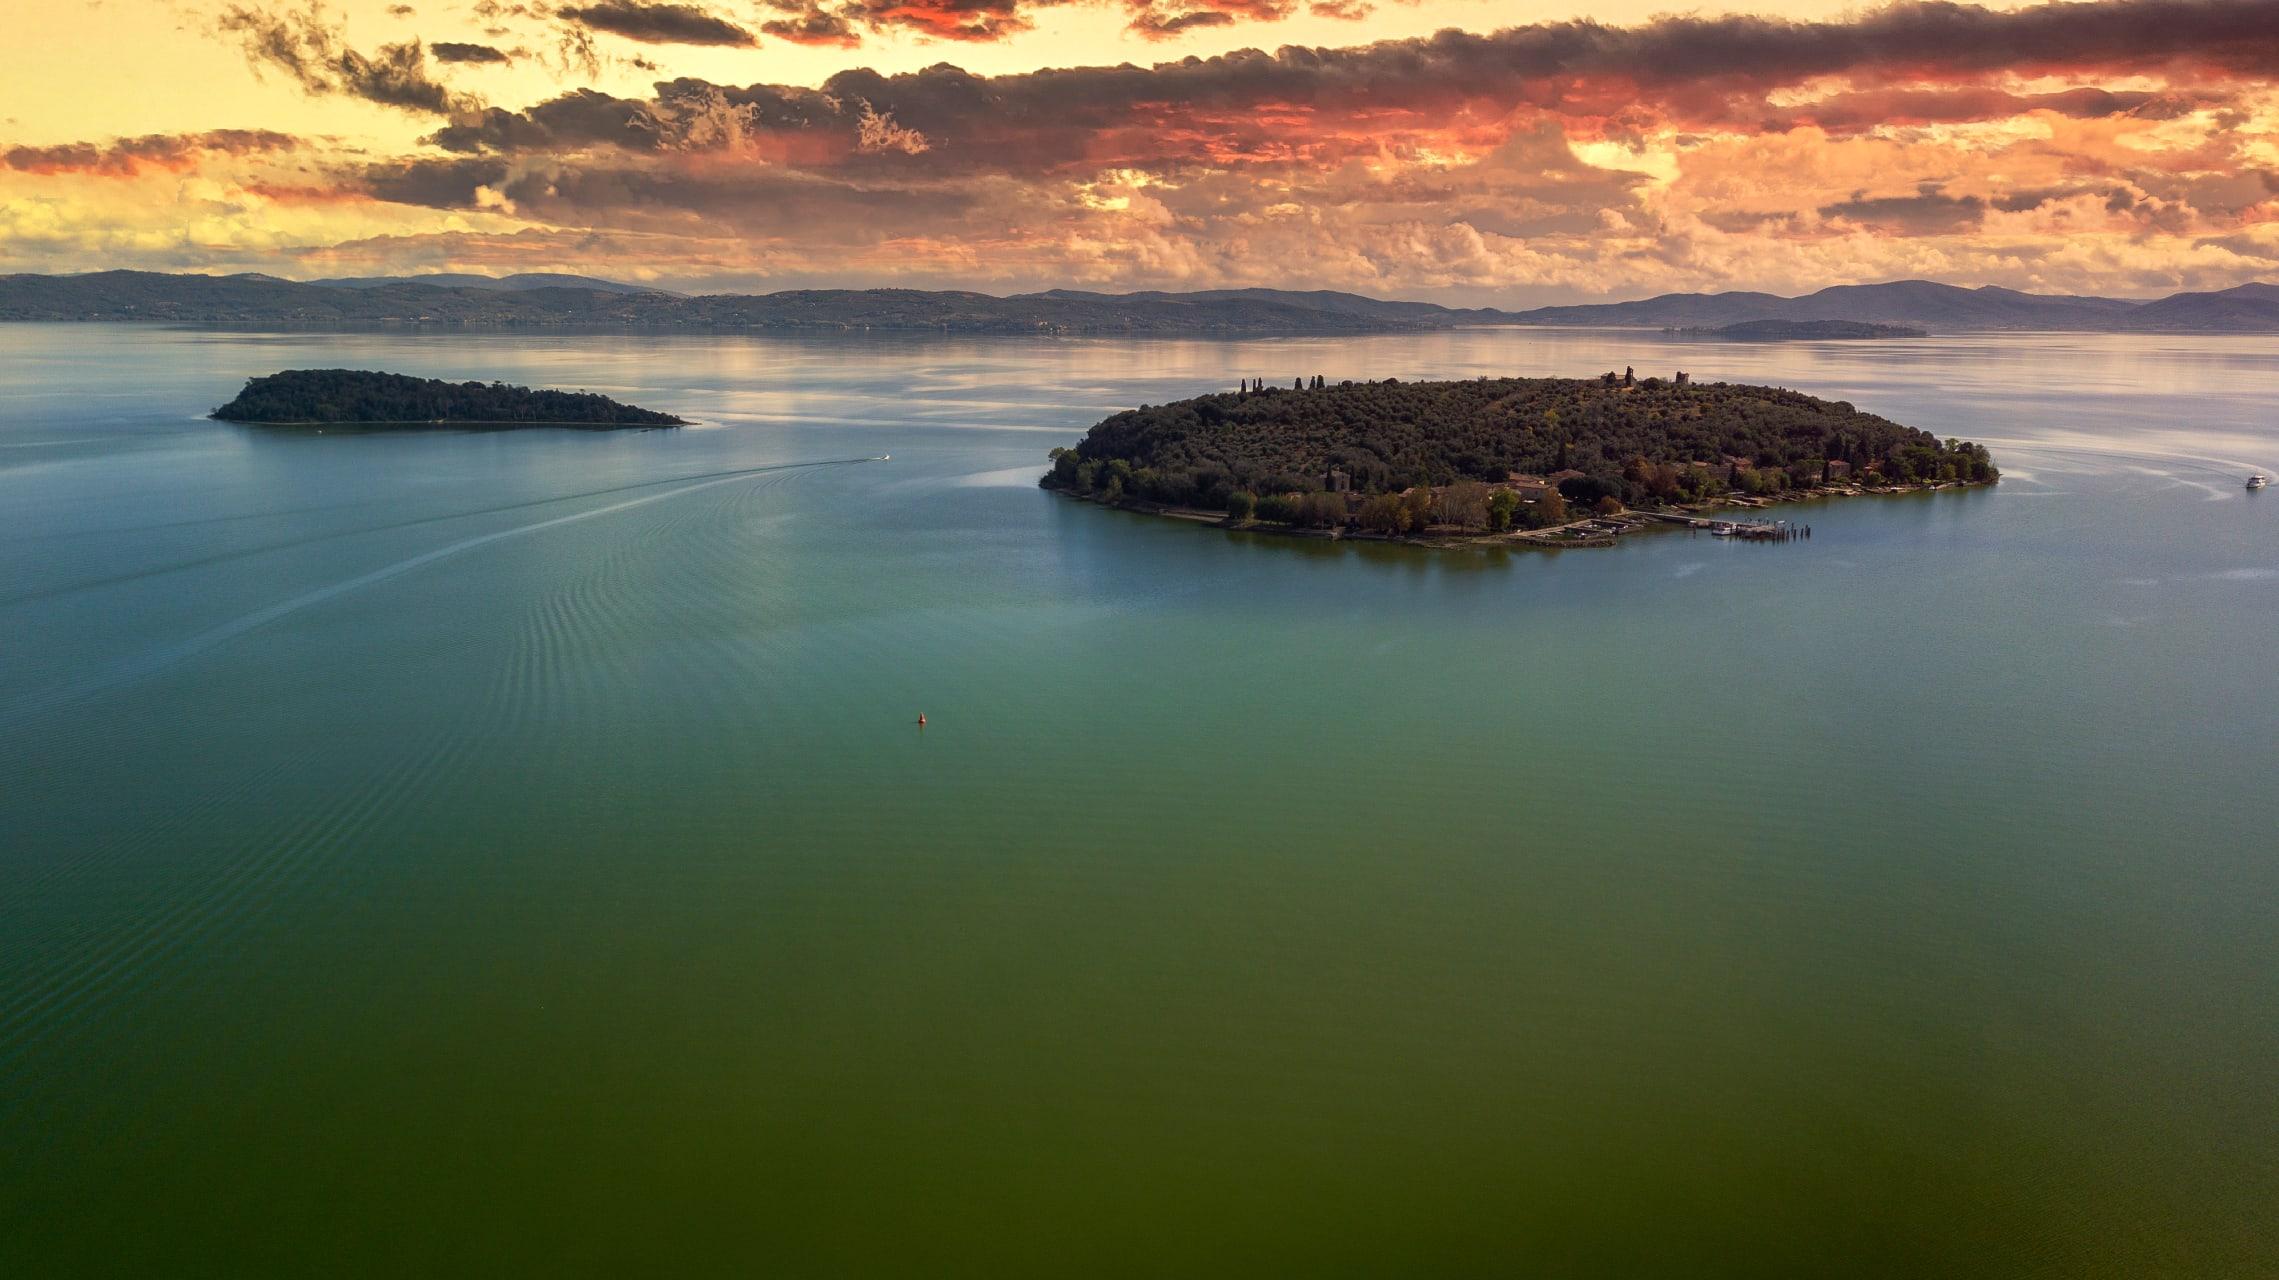 Lake Trasimeno cover image